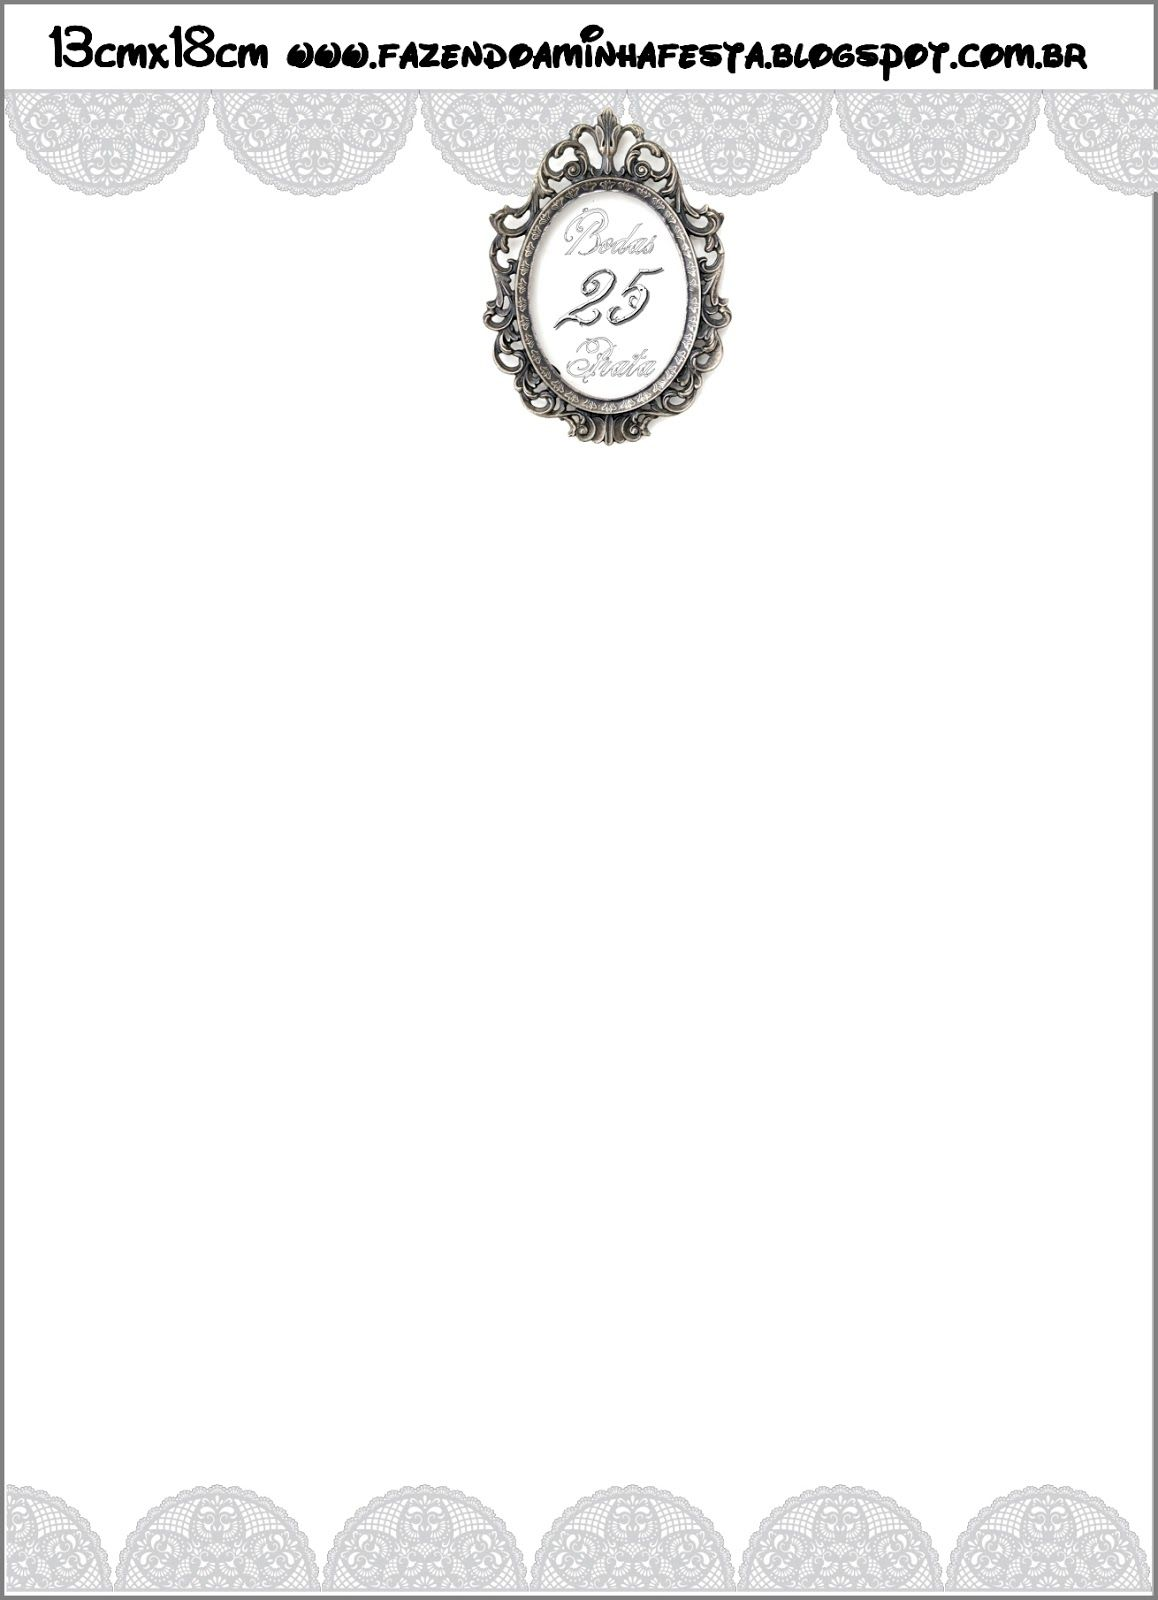 Bodas De Prata Renda Branca Kit Completo Com Molduras Para